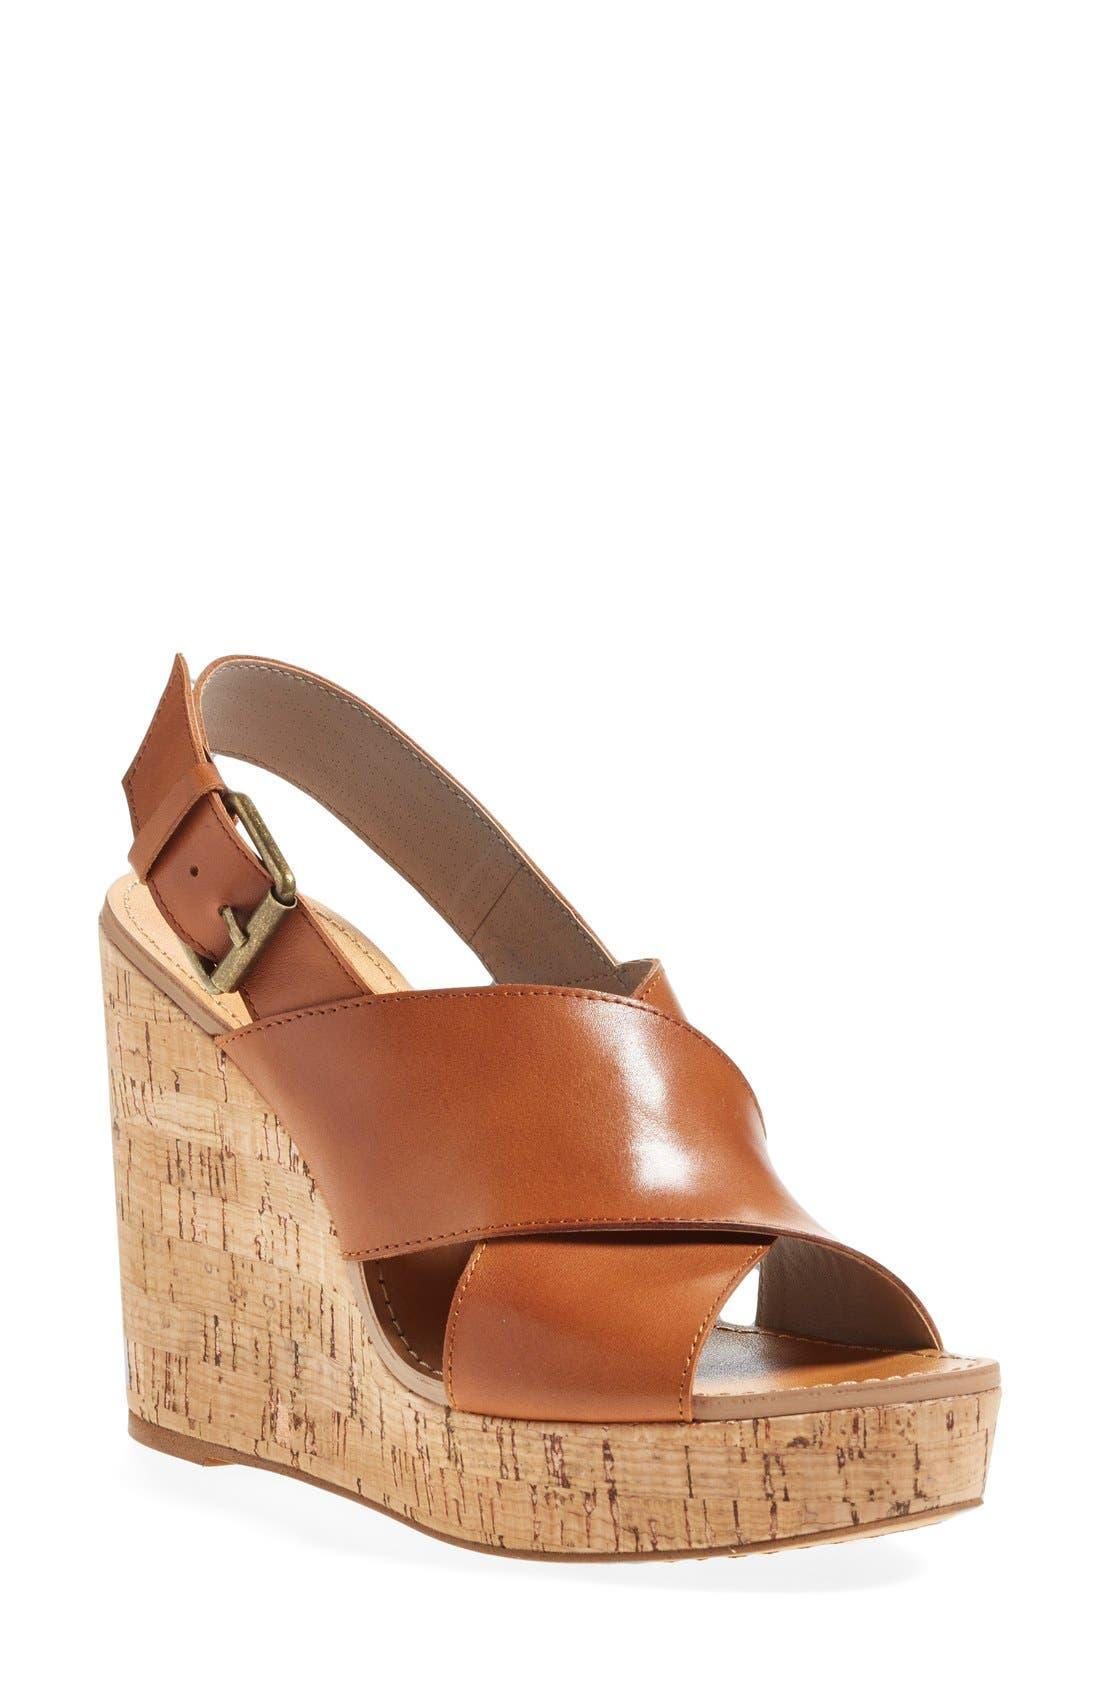 Main Image - Hinge 'Hannah' Wedge Sandal (Women)